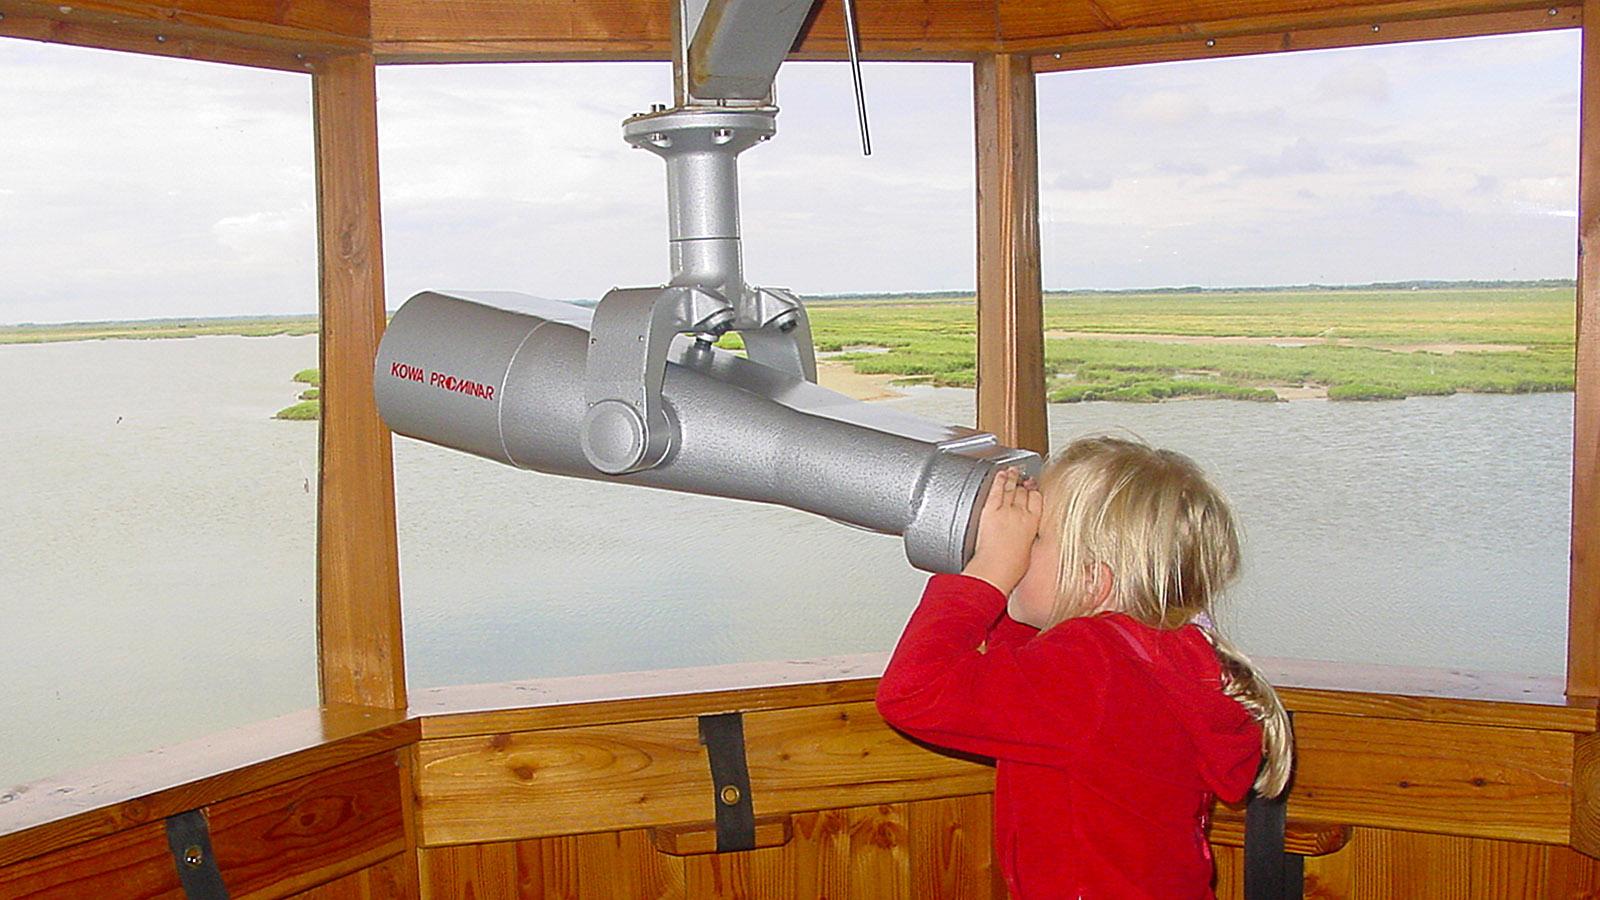 Umgebung Thy: m Vogelbeobachtungshaus von Vejlerne am Limfjord. Foto: HIlke Maunder